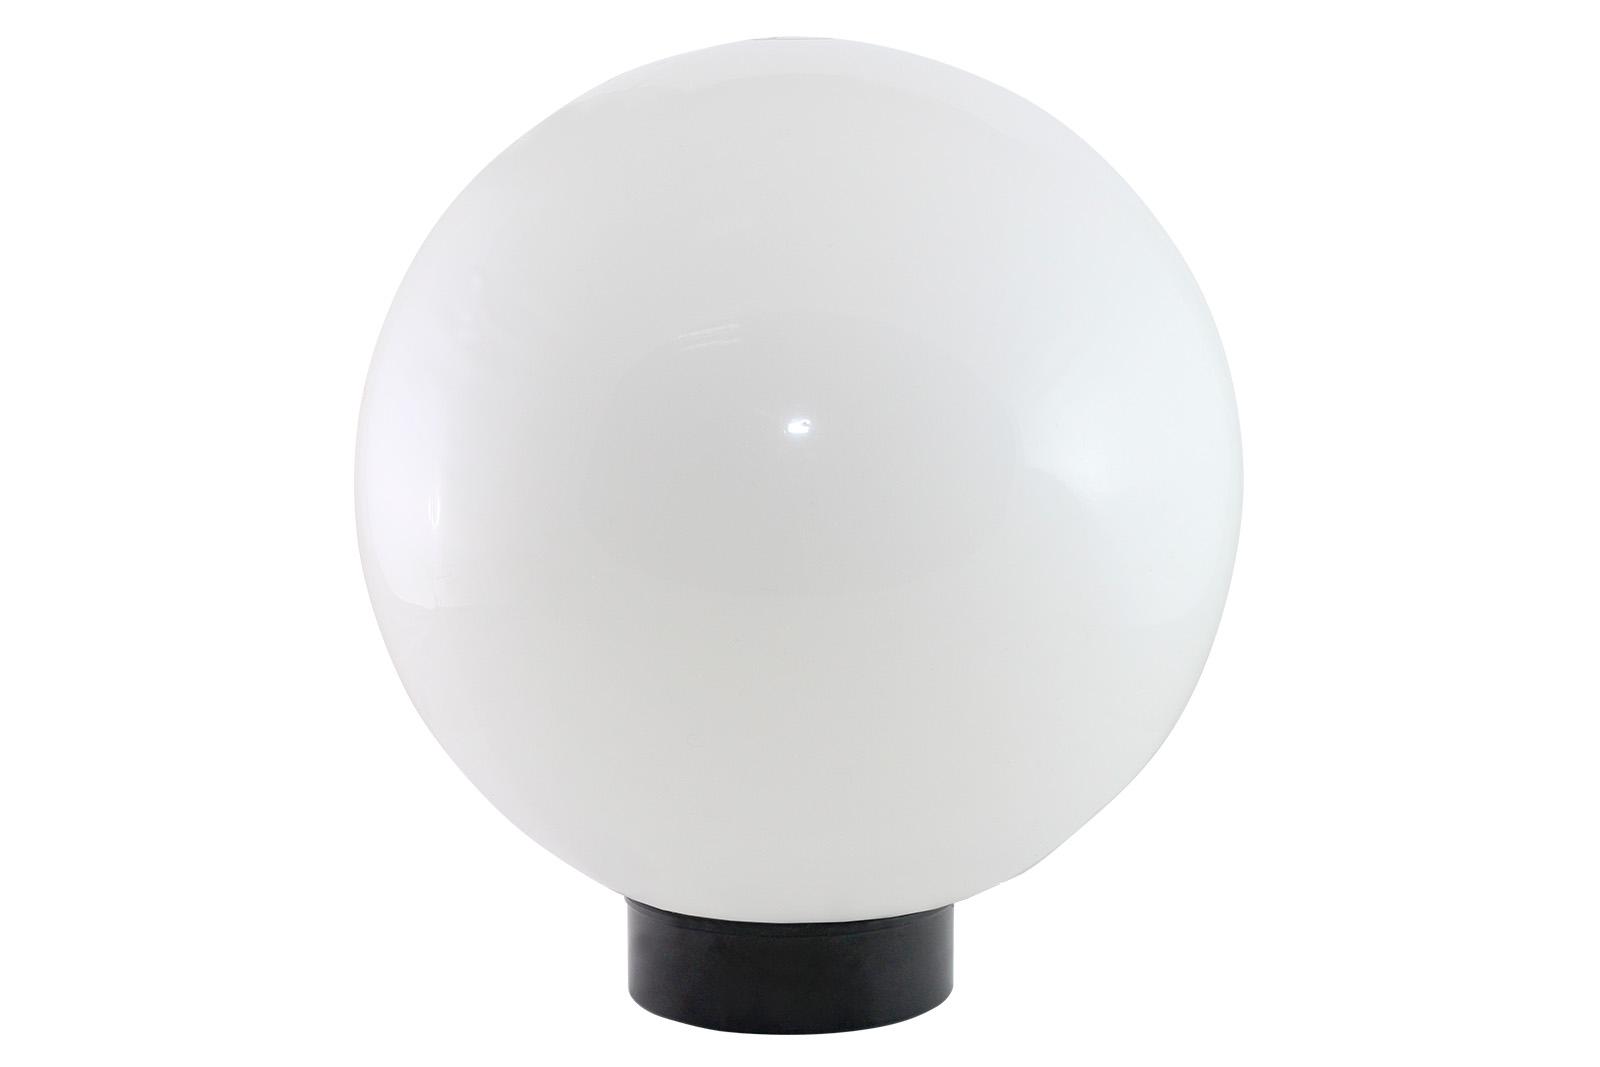 Фото Светильник НТУ 03- 60-250 шар d=250 мм IP54 (опал ПММА, основание плоское ПК, Е27) TDM {SQ0330-0613}